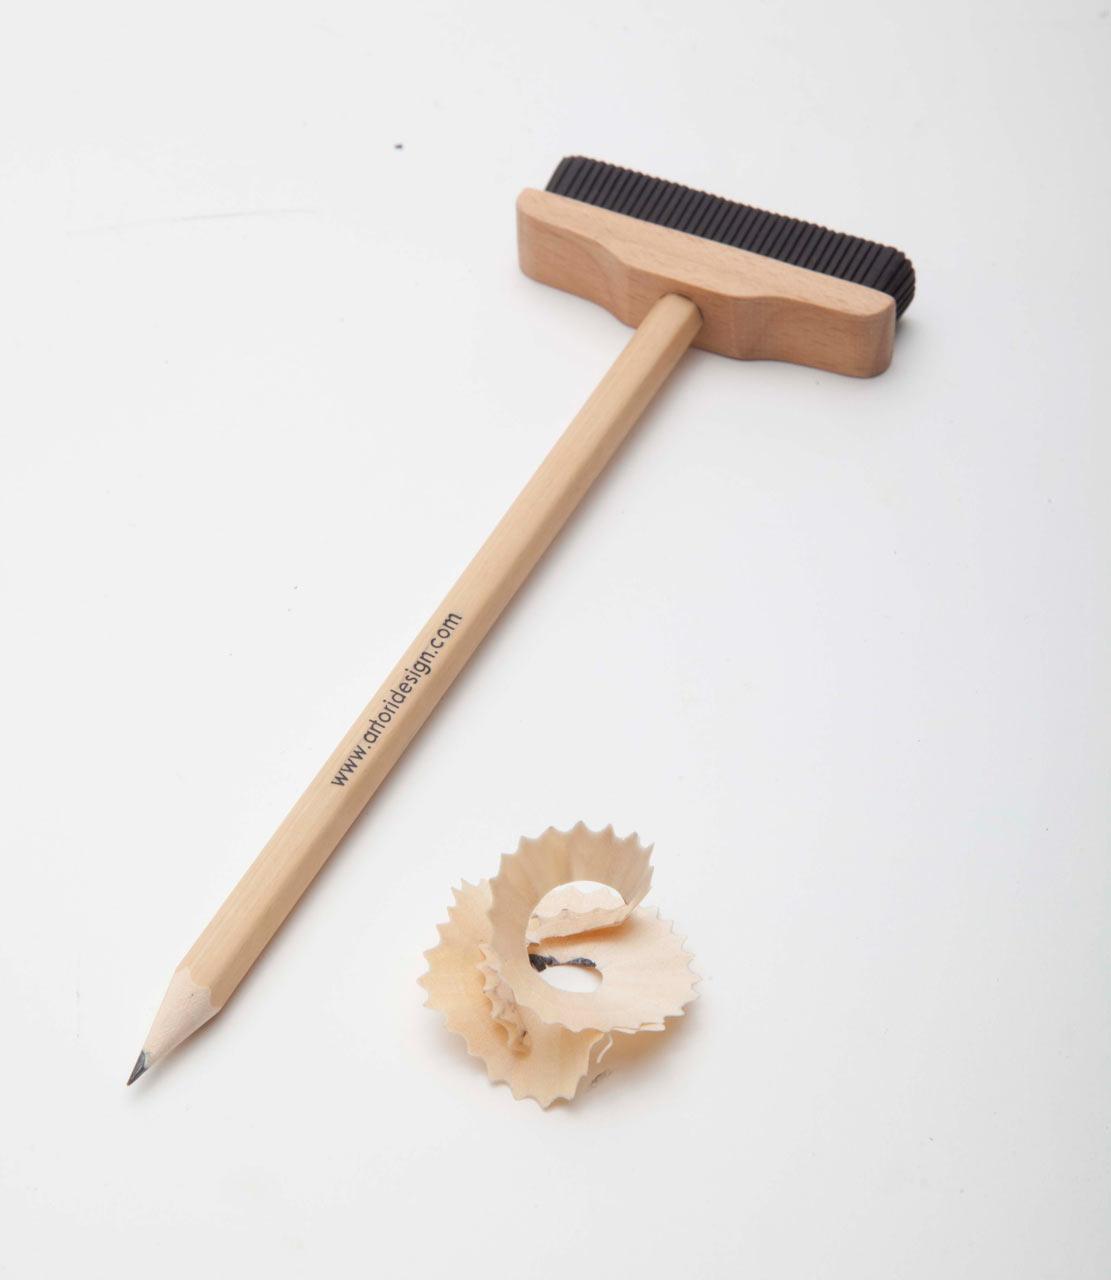 Artori-Design-3-Pencil-Broom